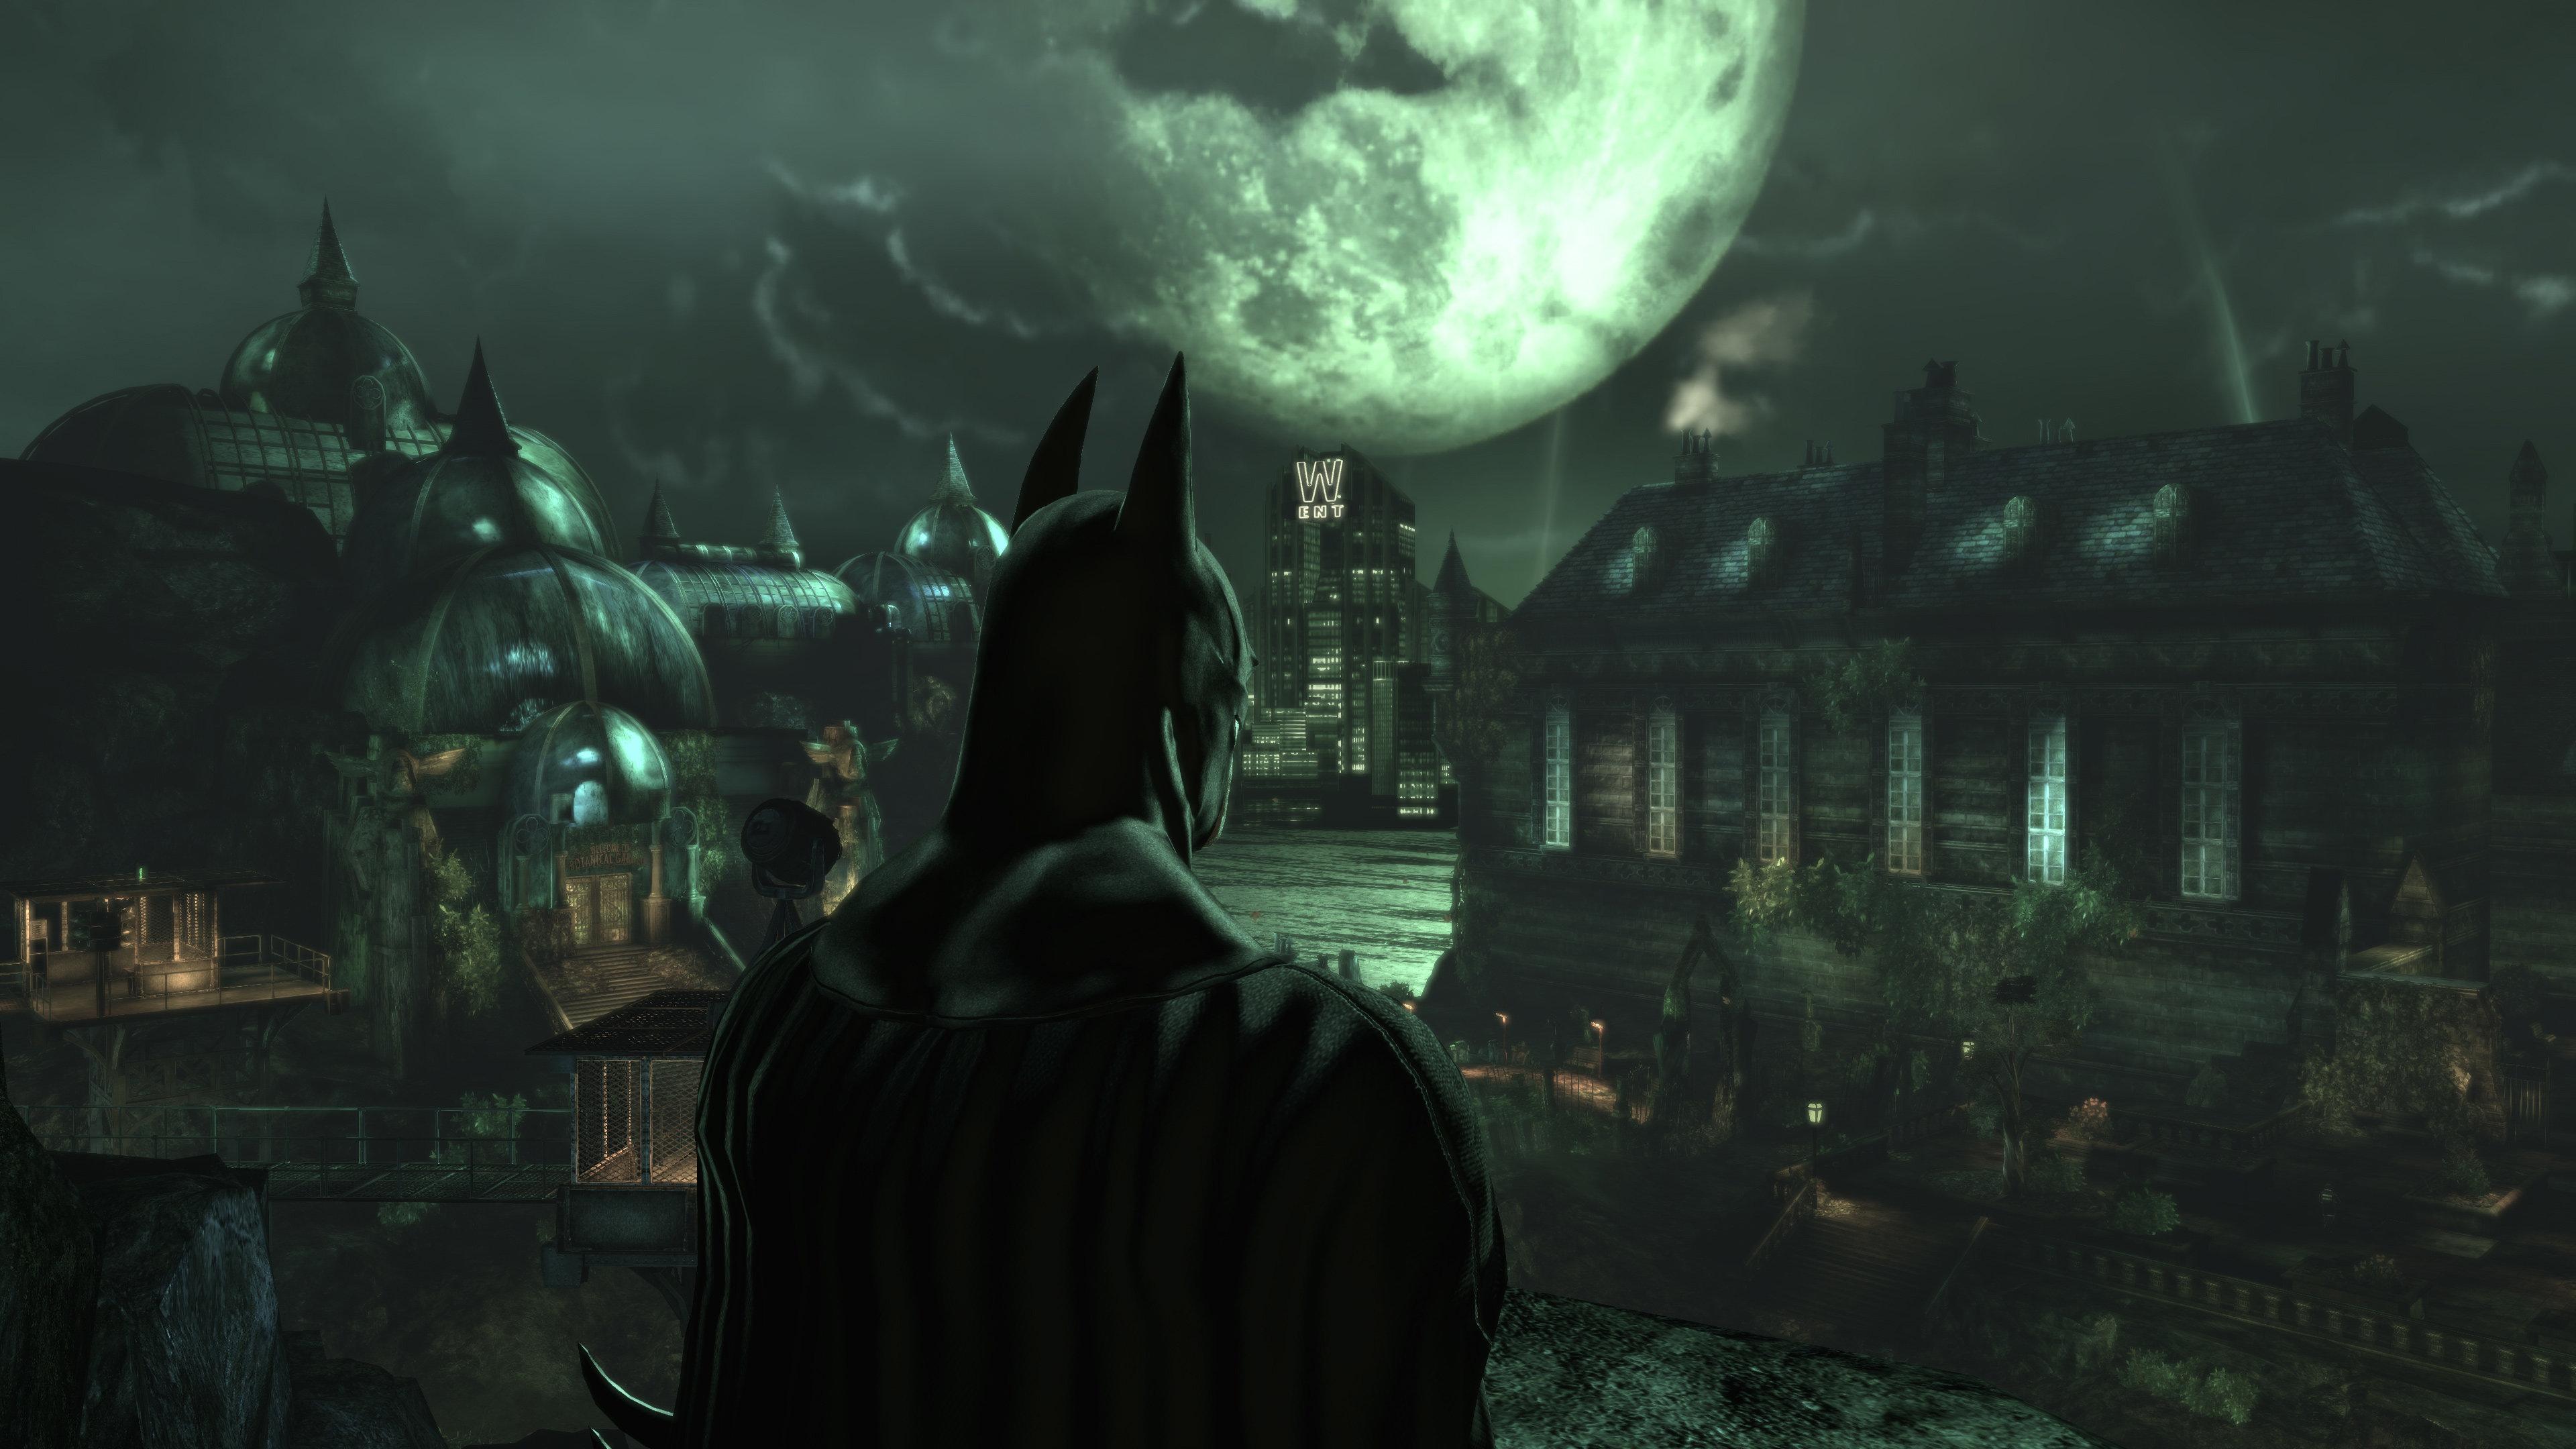 Batman Video Game Wallpapers 3840x2160 Ultra Hd 4k Desktop Backgrounds